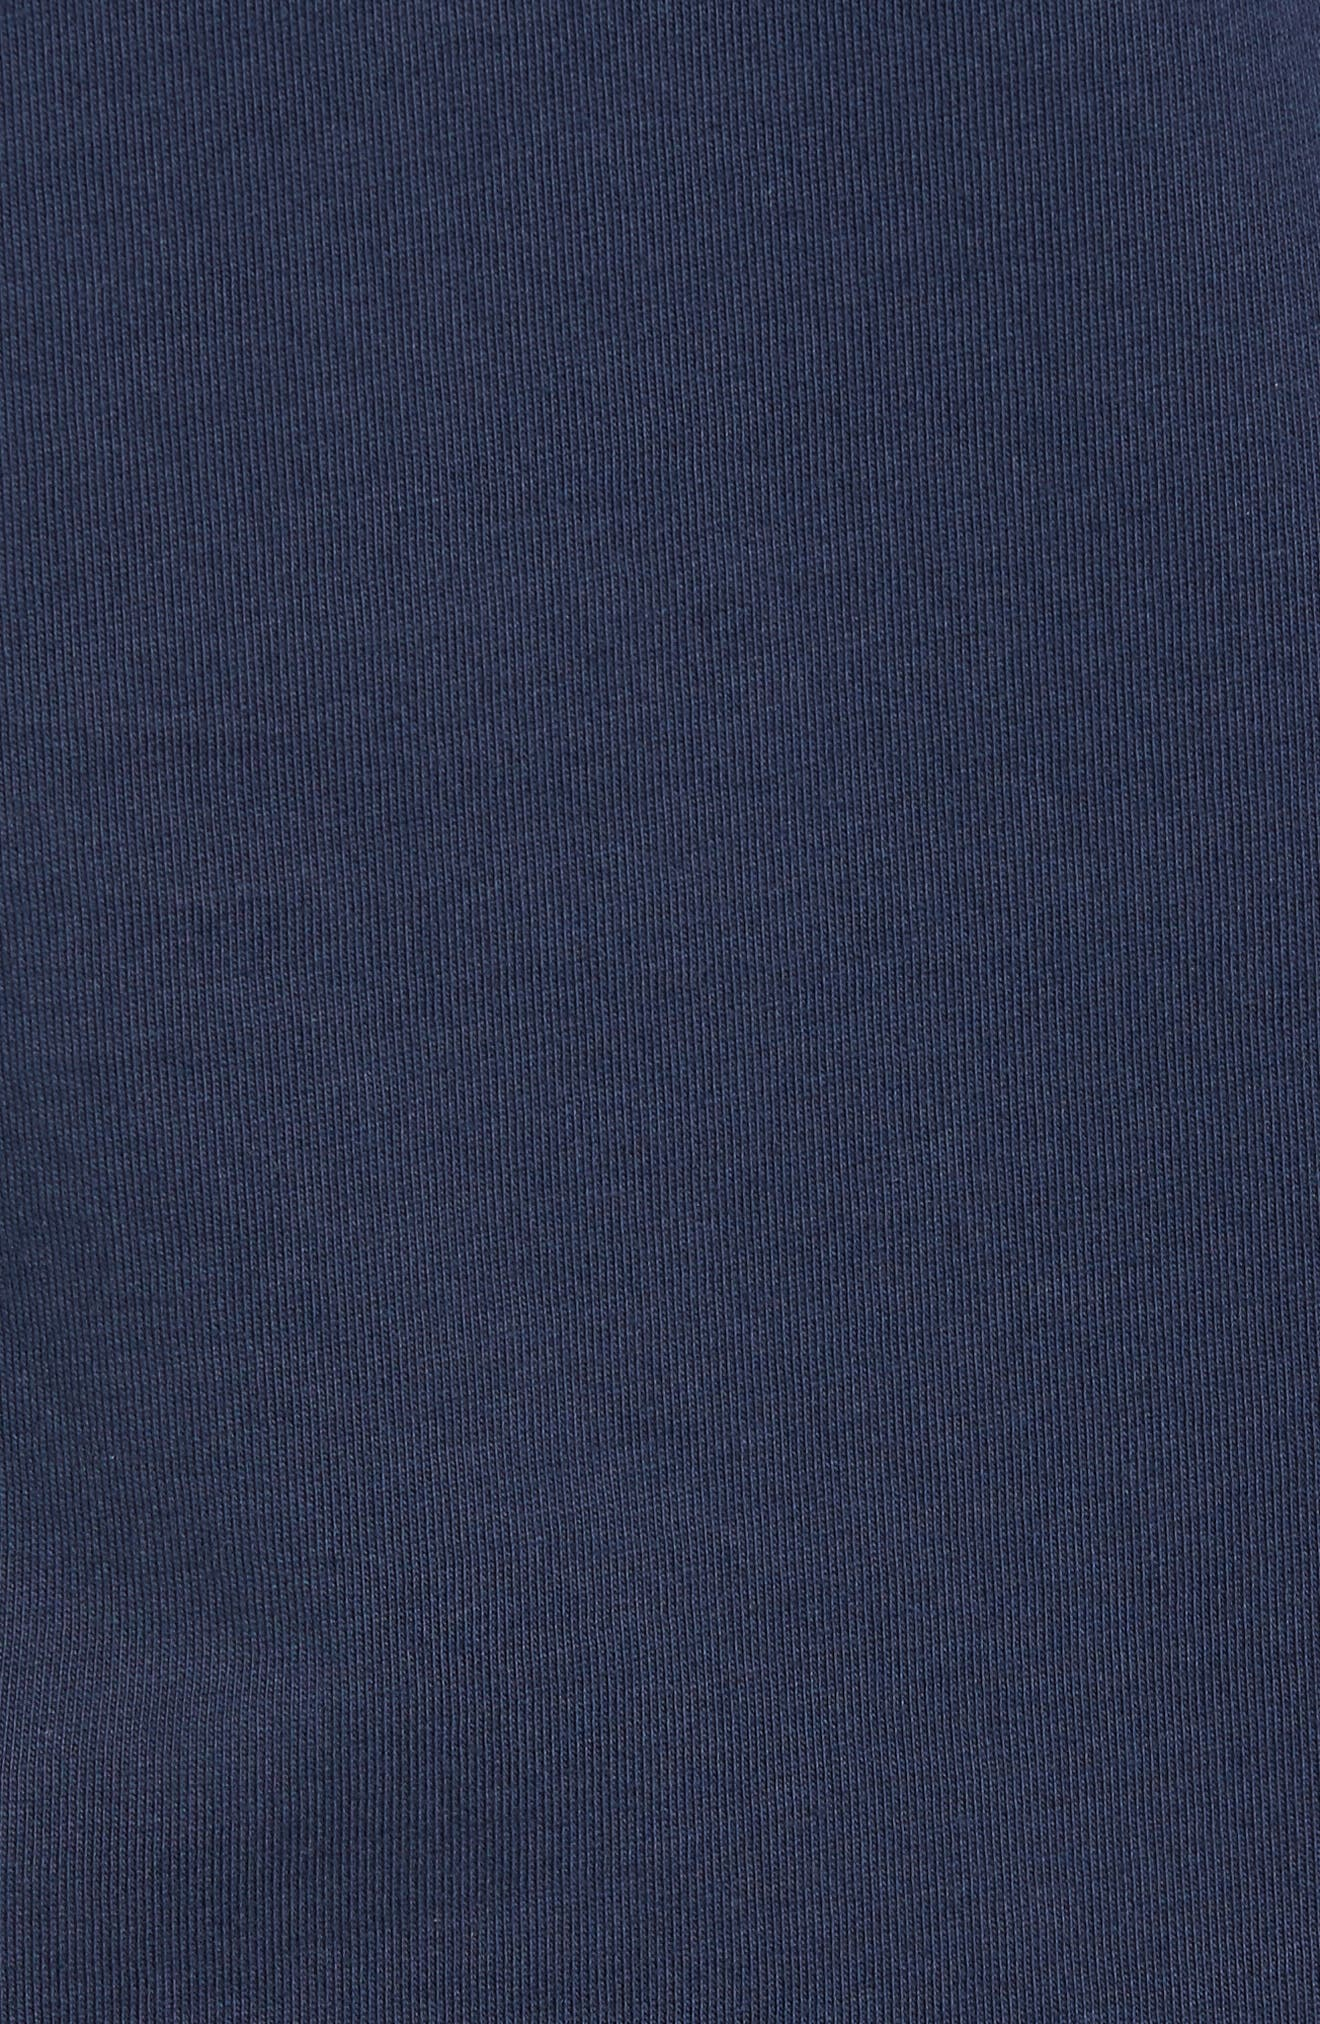 Turkey Whale Graphic Long Sleeve Pocket T-Shirt,                             Alternate thumbnail 5, color,                             406